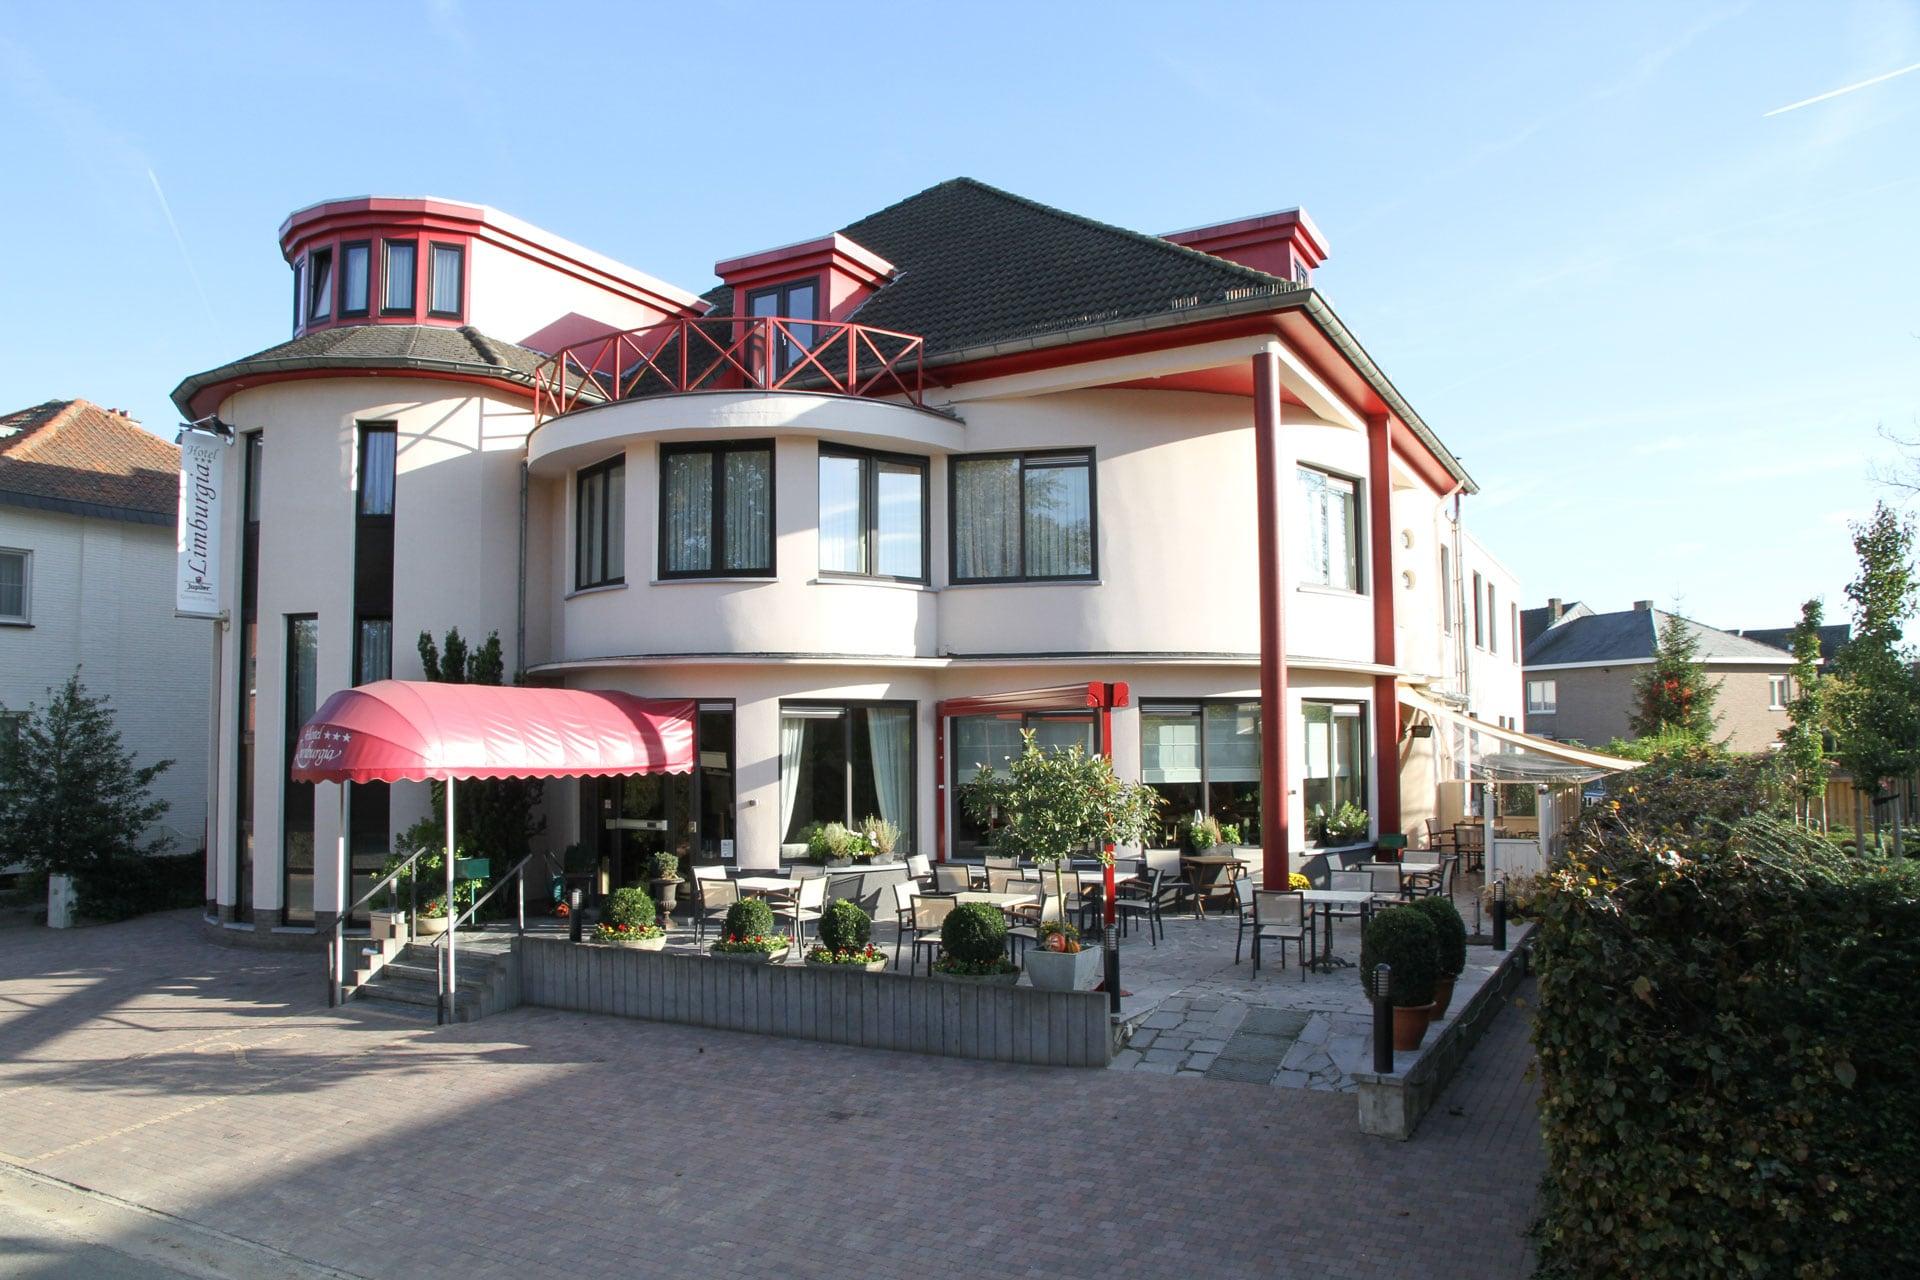 Bedrijven - Limburgia